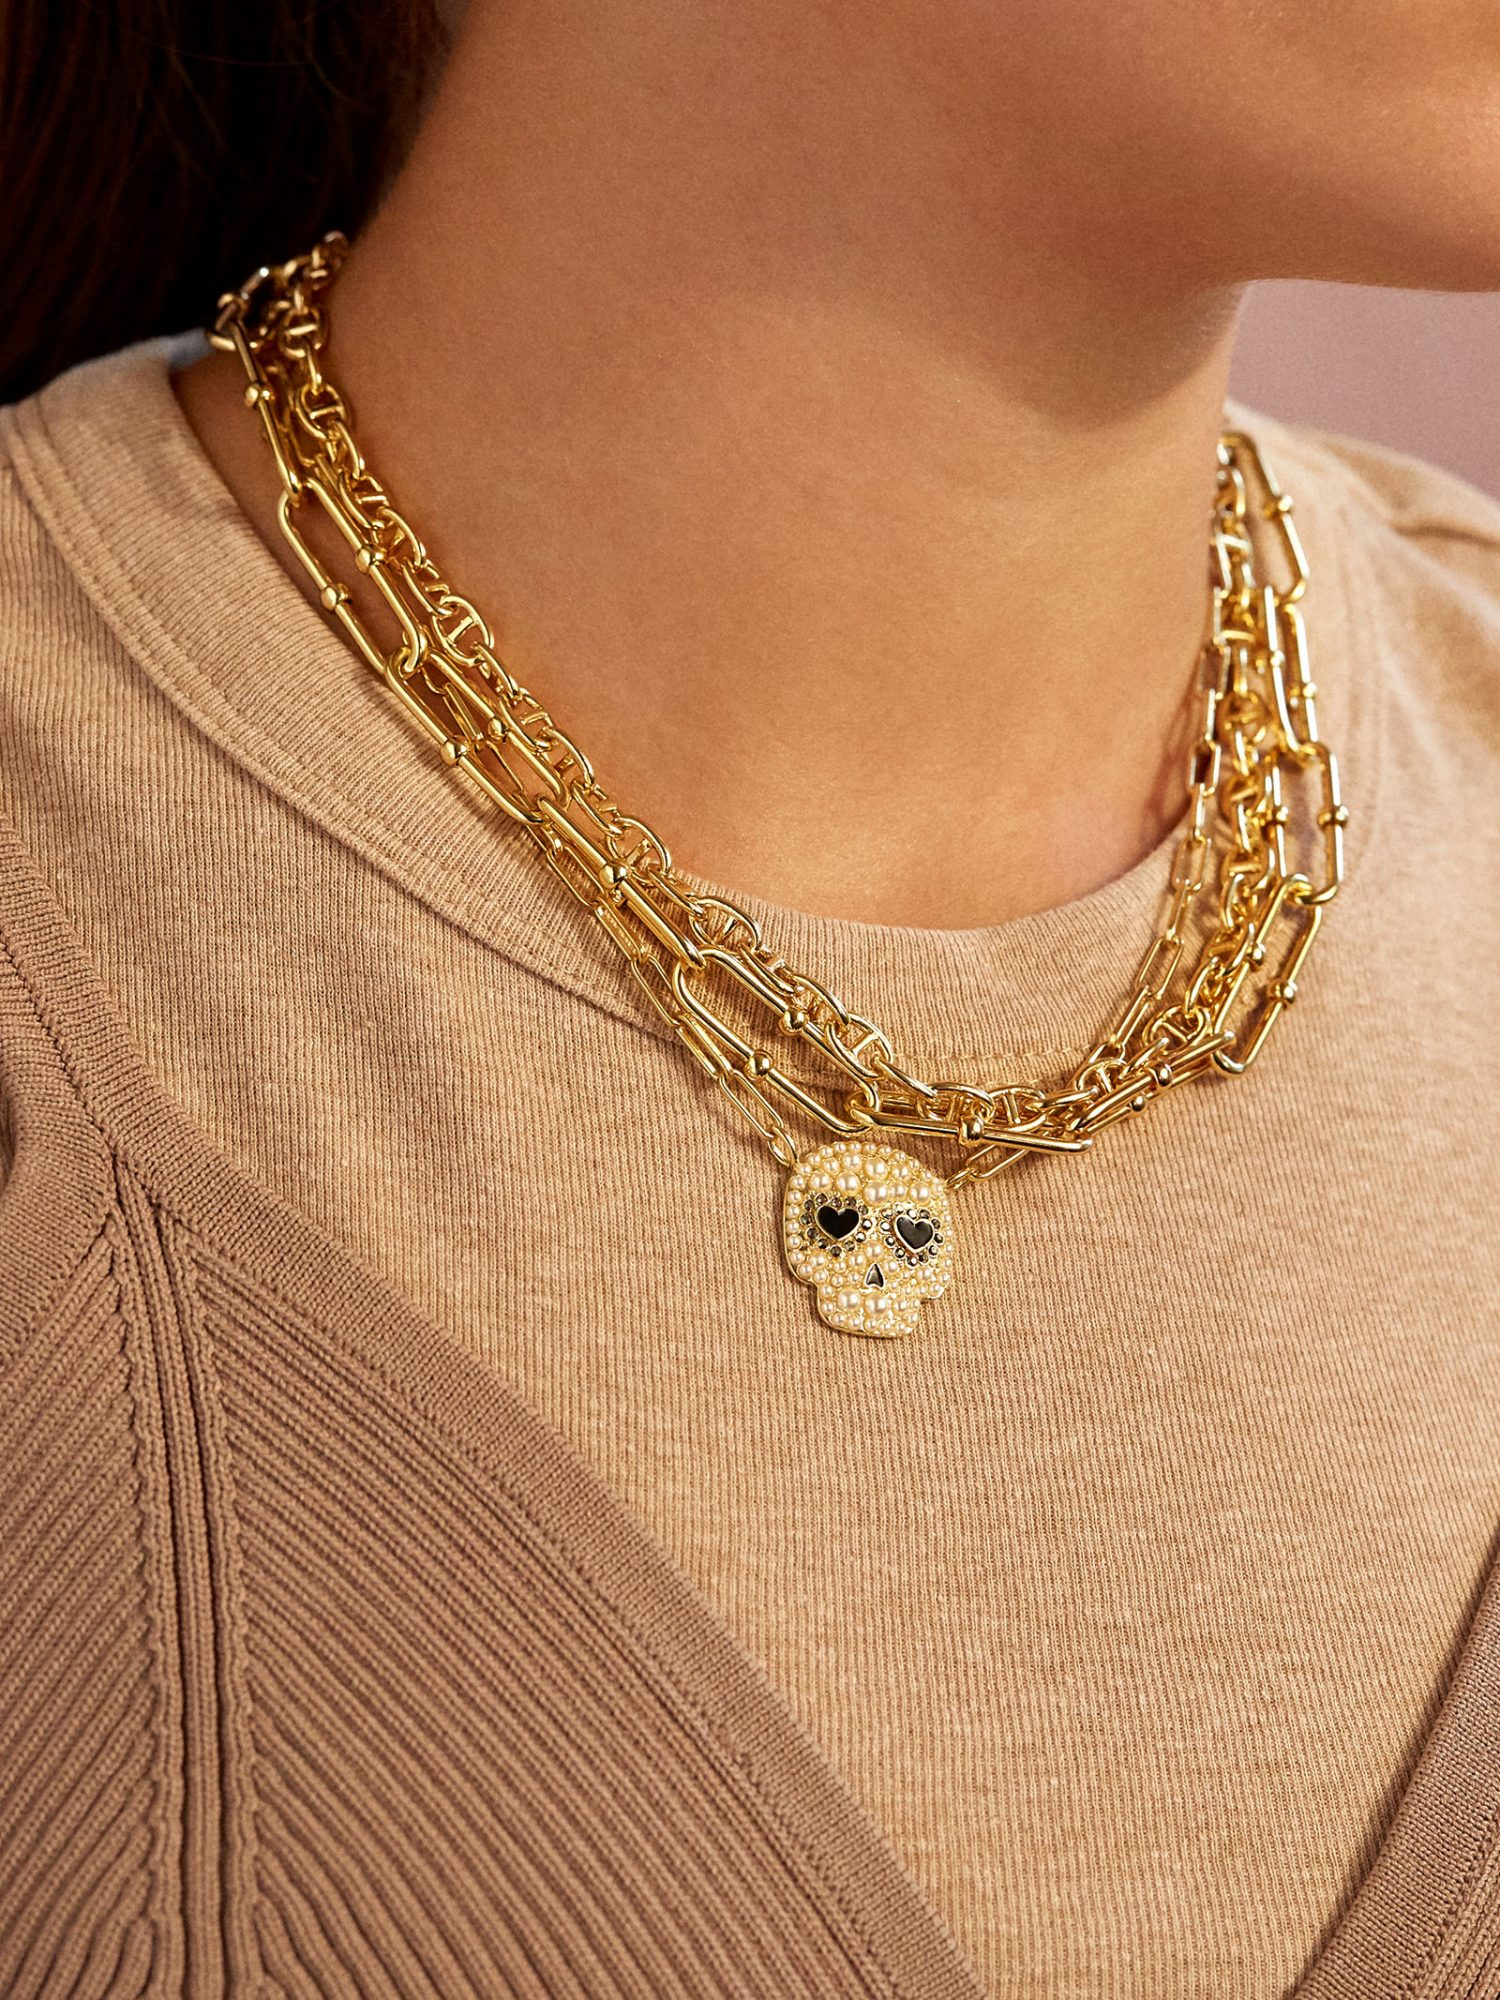 baublebar halloween necklace